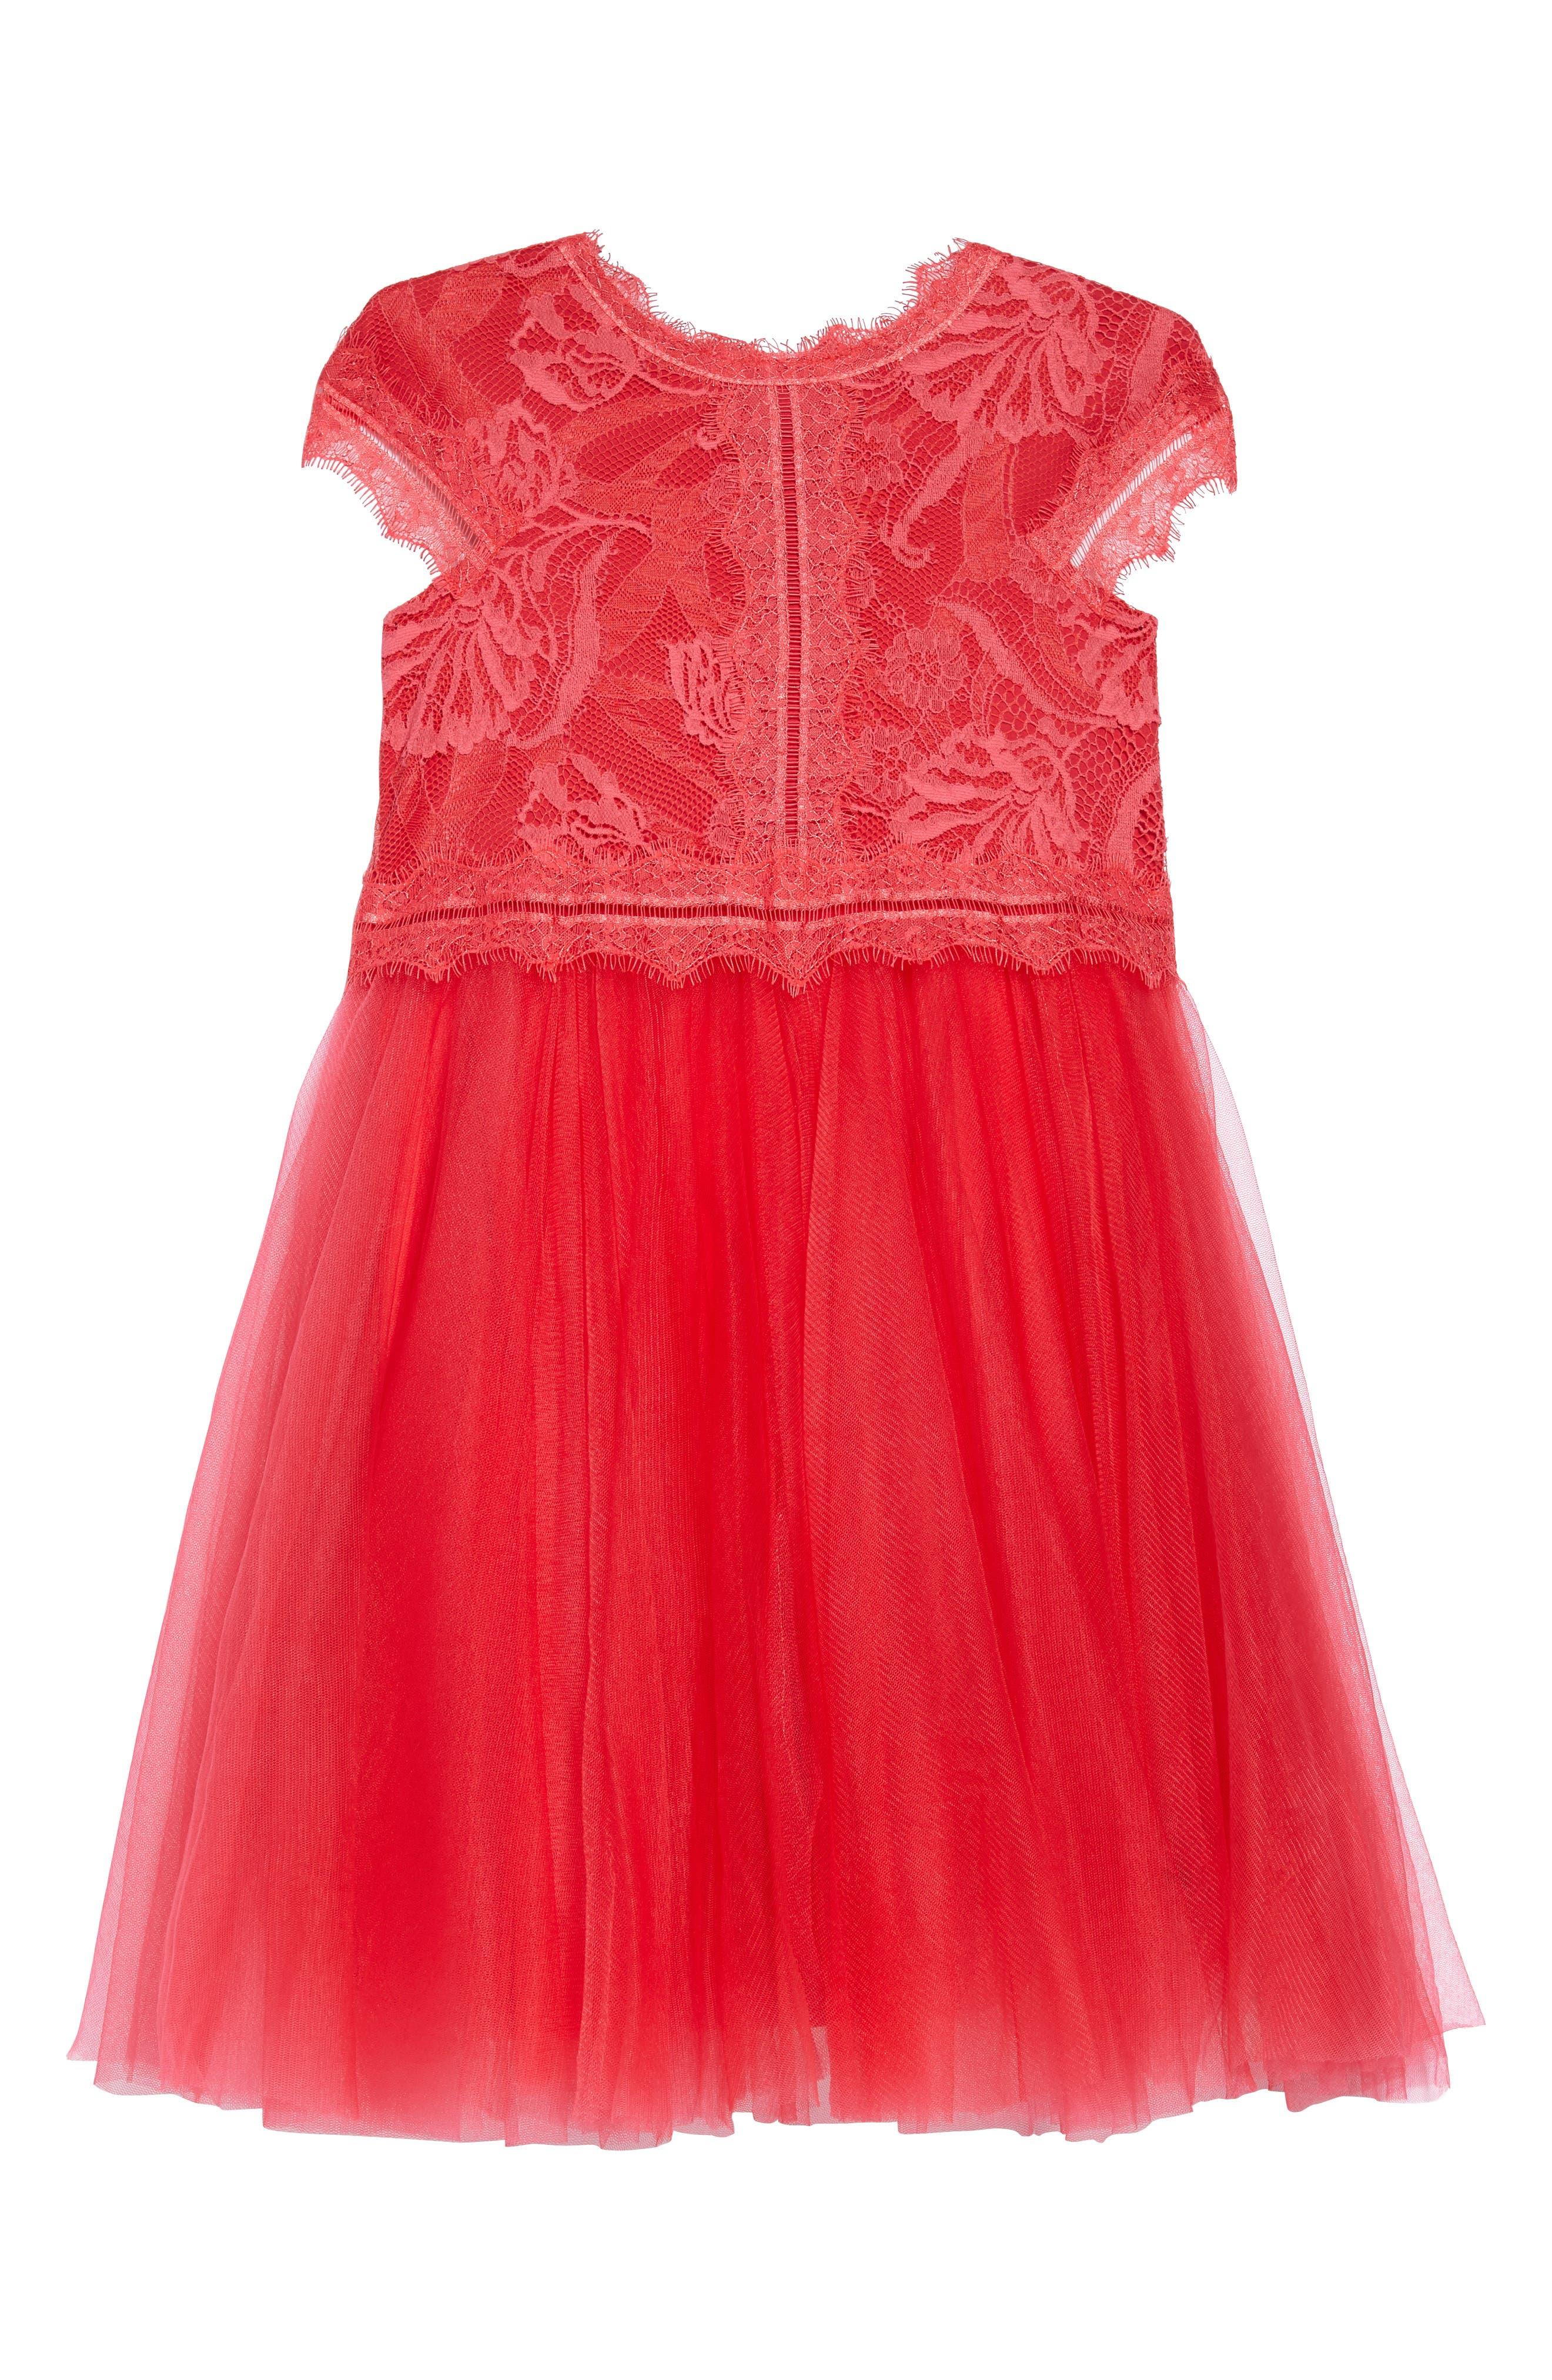 Floral Lace Tulle Dress,                         Main,                         color,